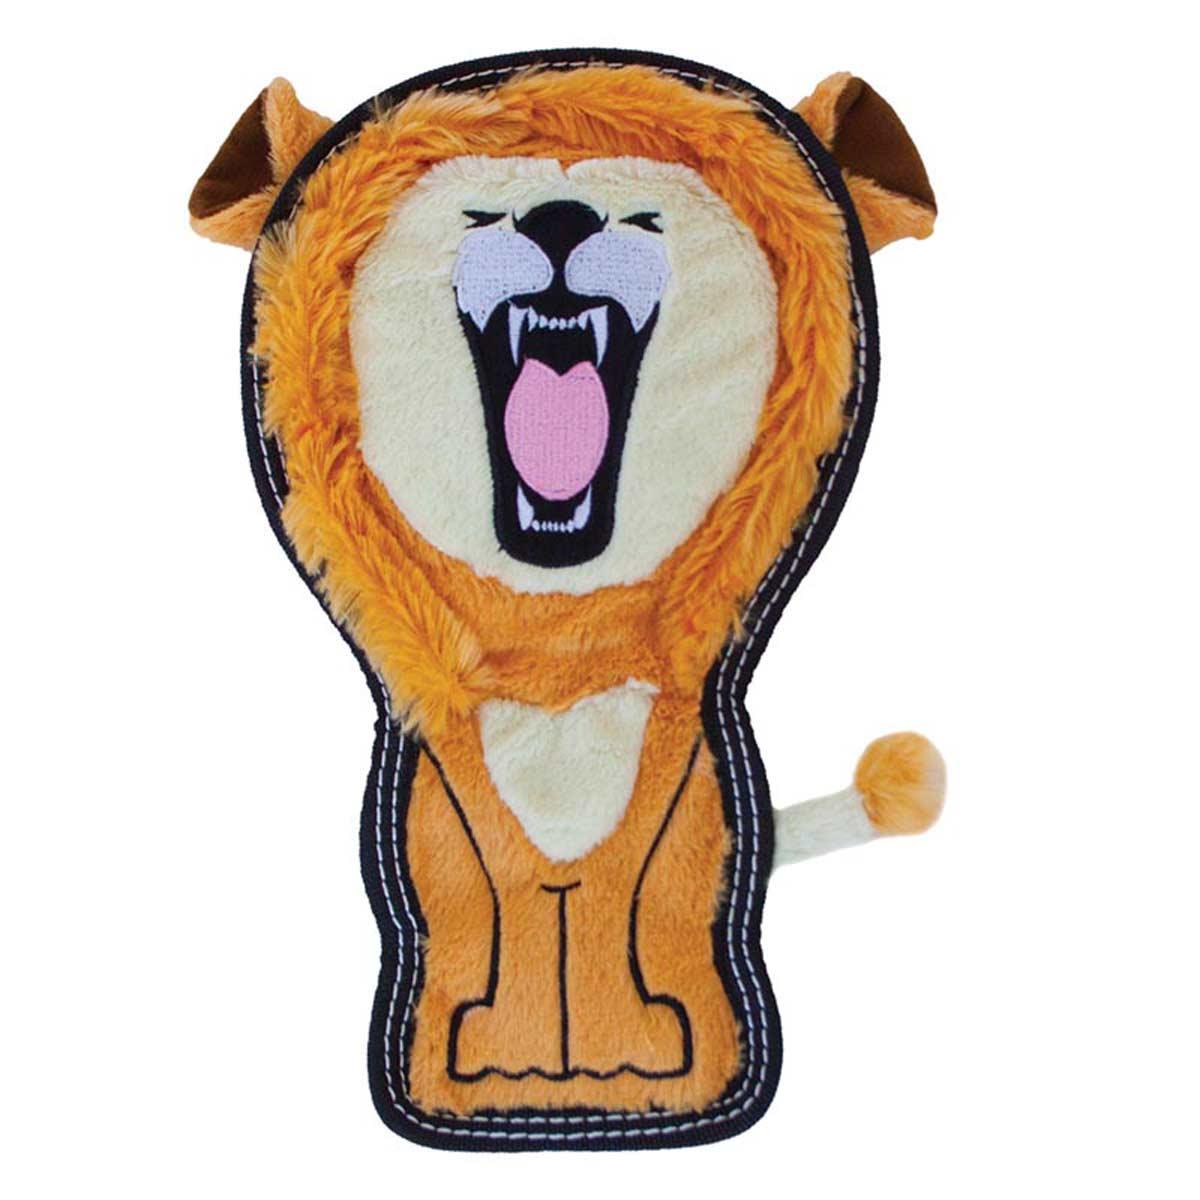 Outward Hound Invincibles Tough Seamz Lion - Heavy Chewers